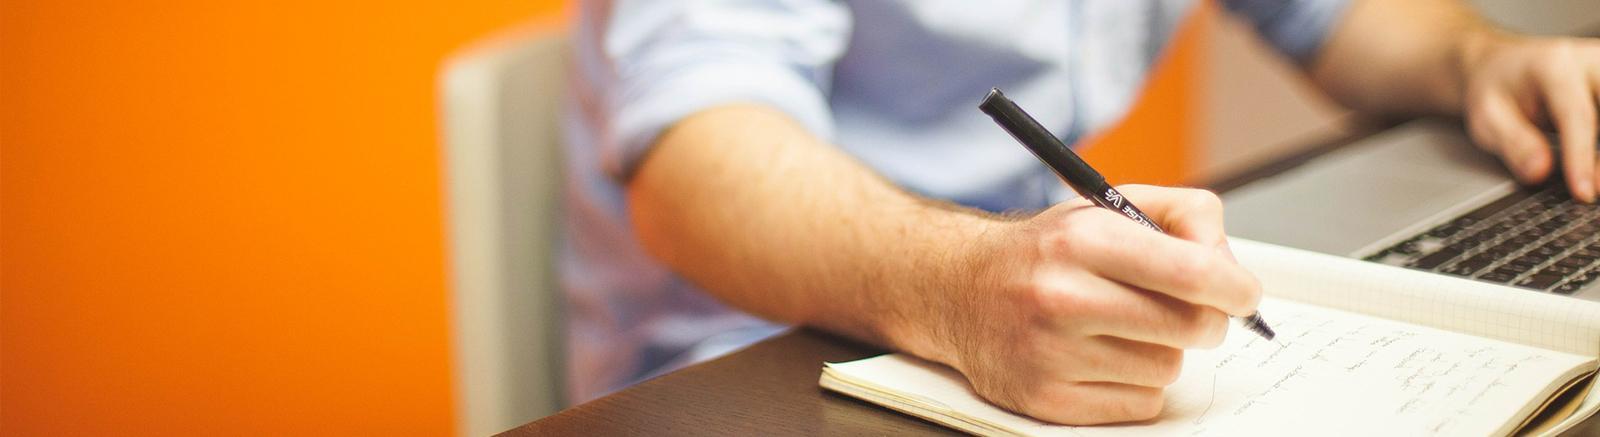 Mortgages for Self-Employed Borrowers Edmonton, Alberta